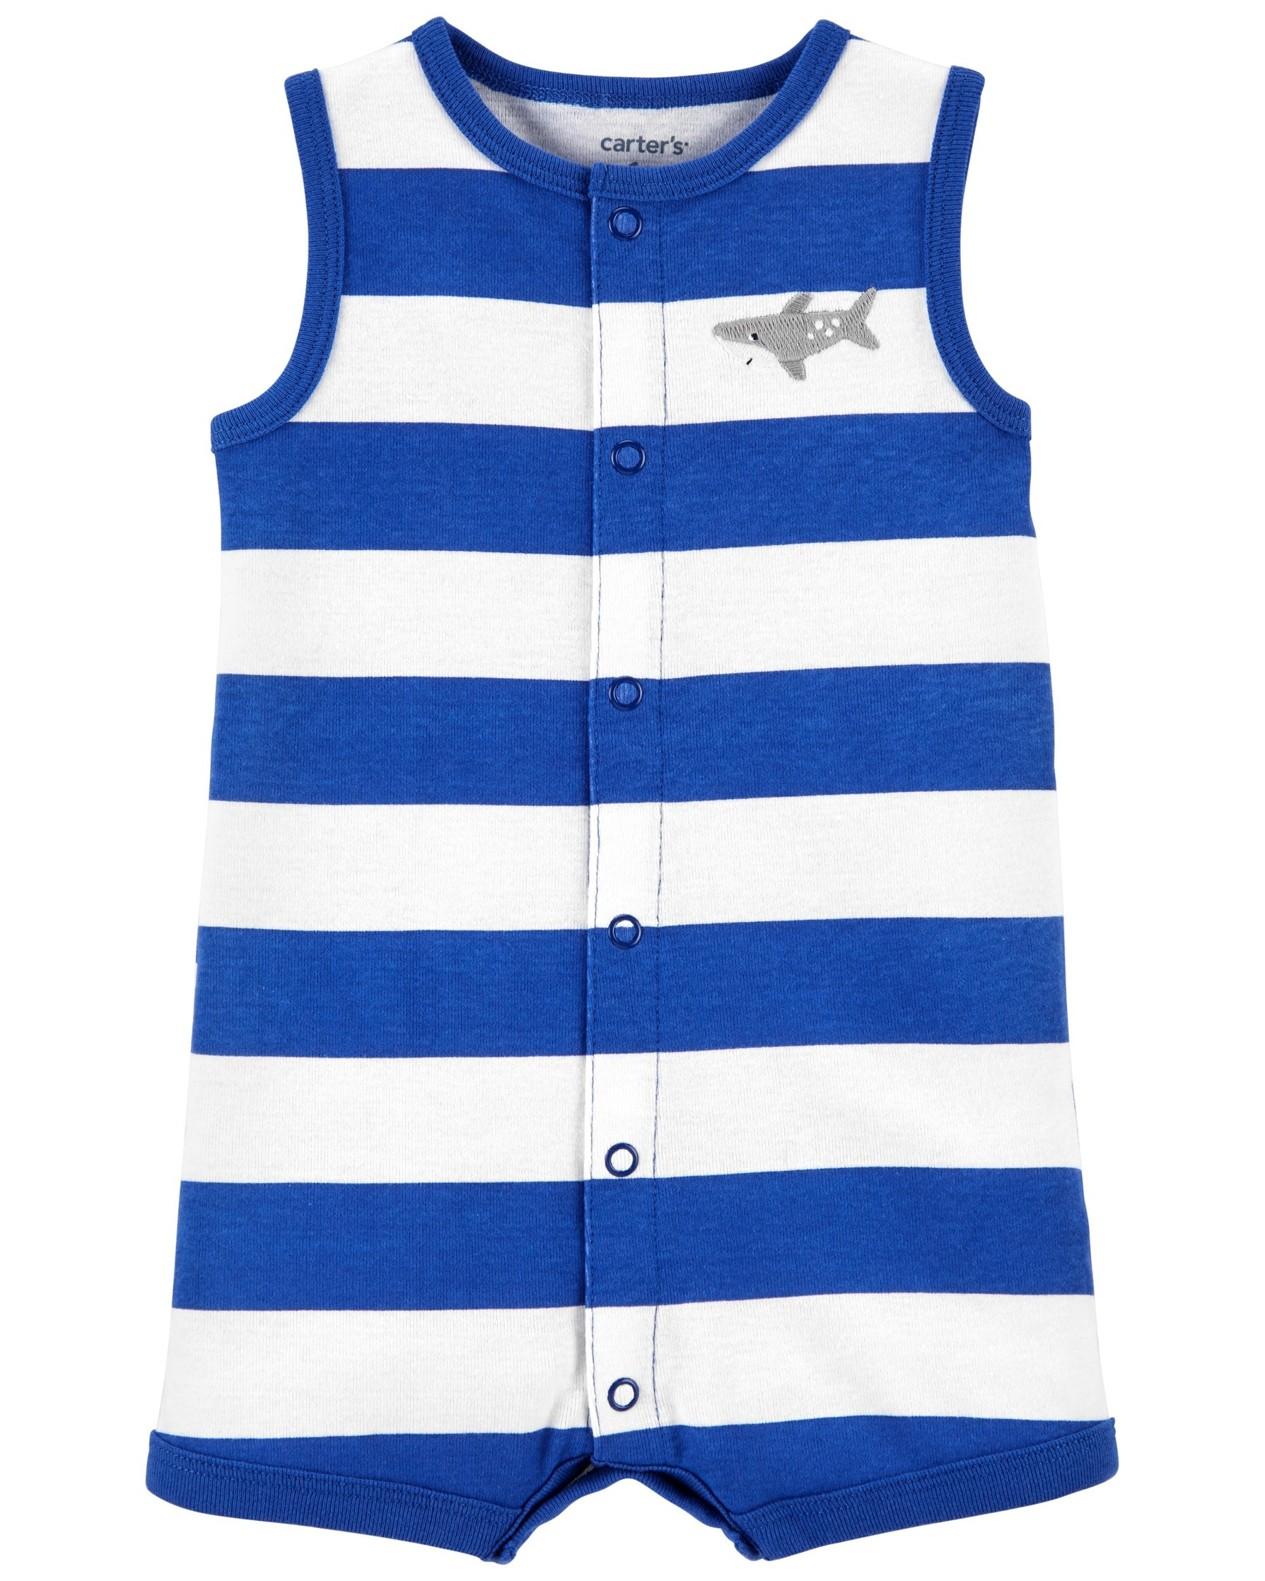 CARTER'S Opaľovačky Blue Stripe Shark chlapec 9 m, veľ. 74